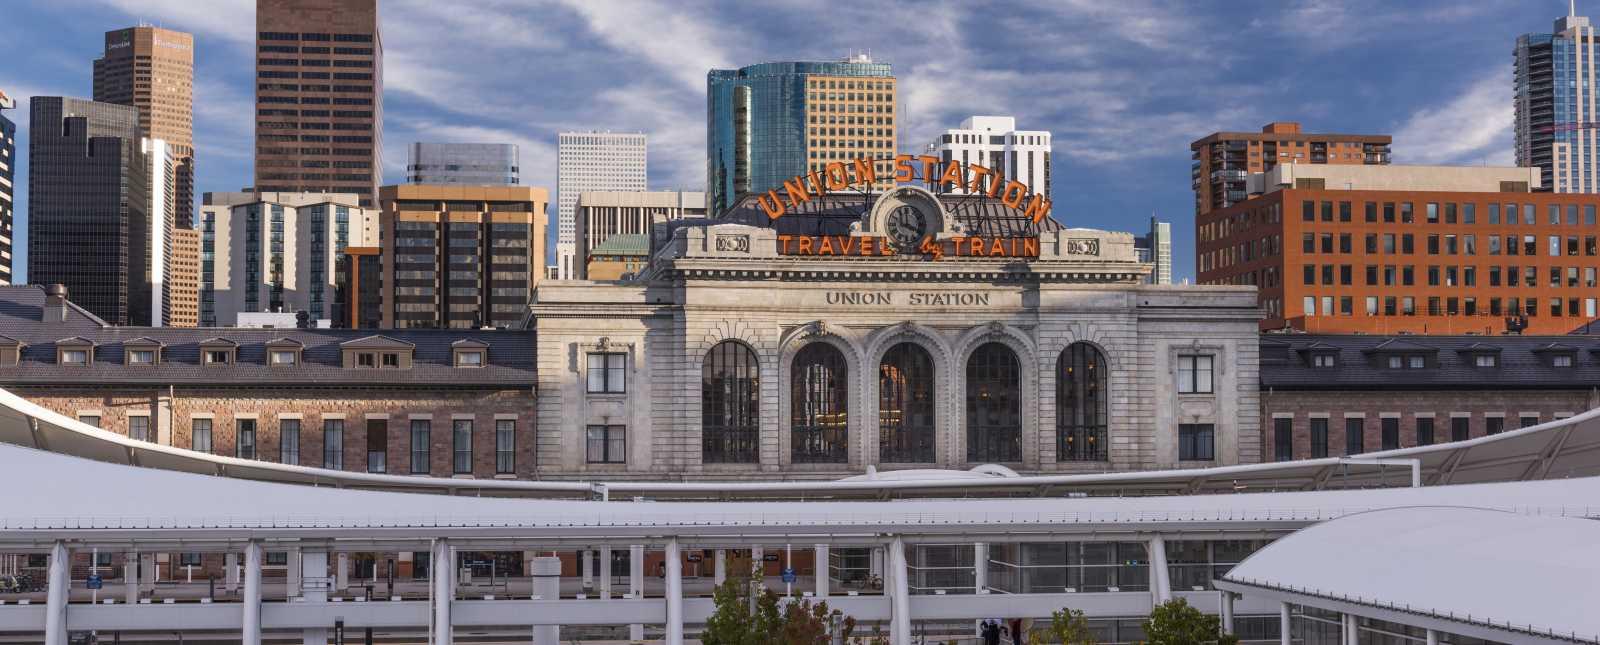 Denver Union Station Skyline